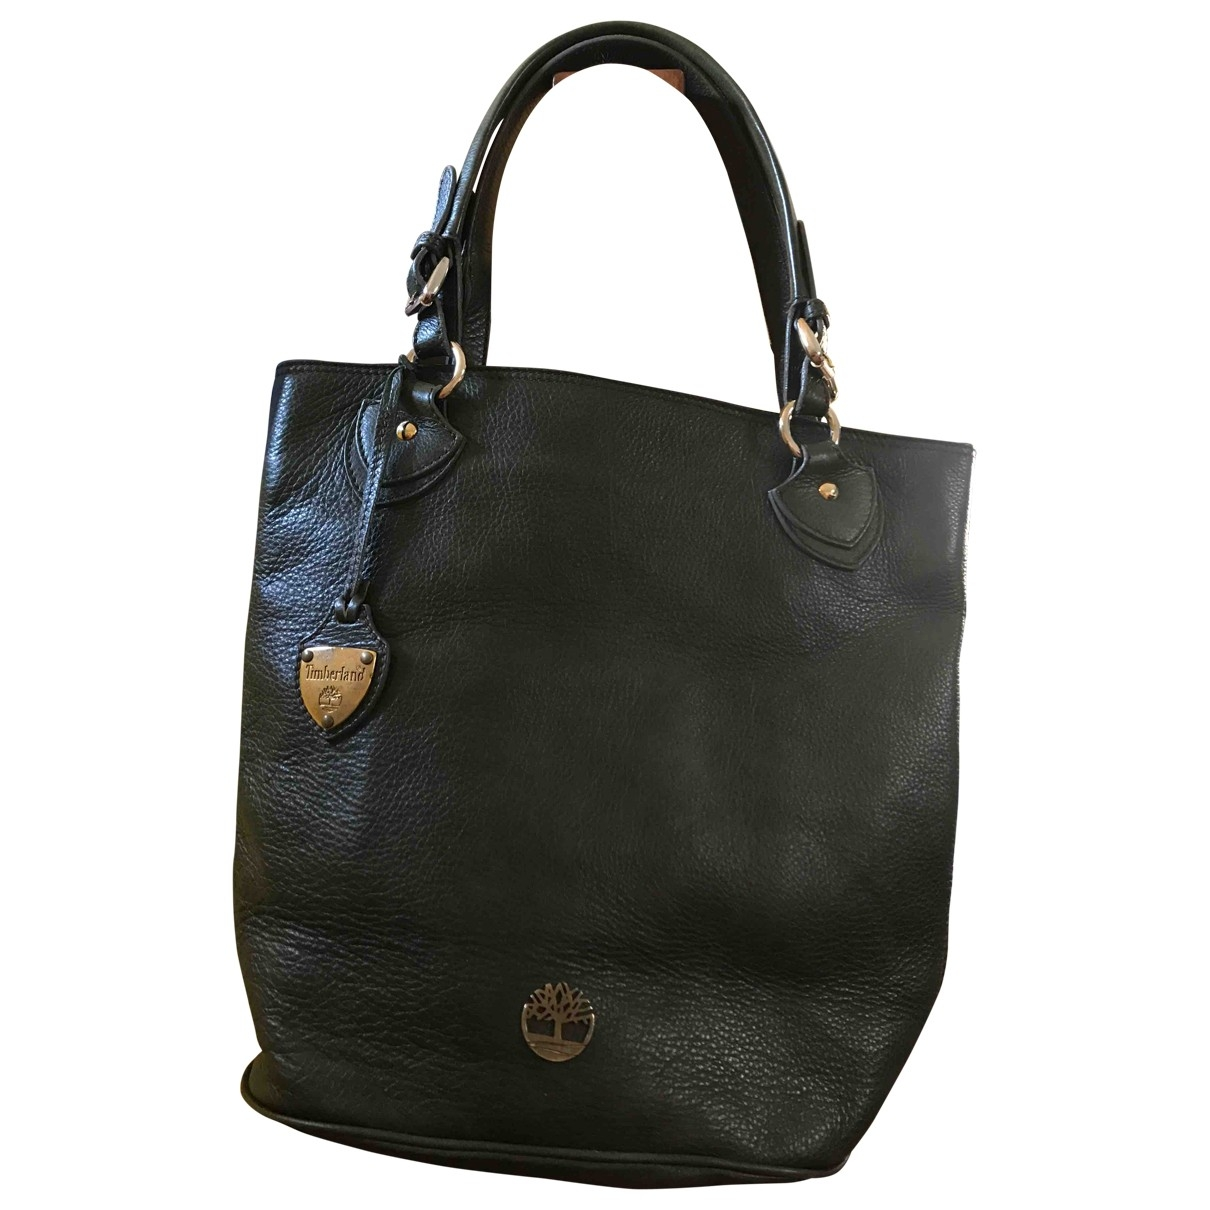 Timberland \N Handtasche in  Gruen Leder